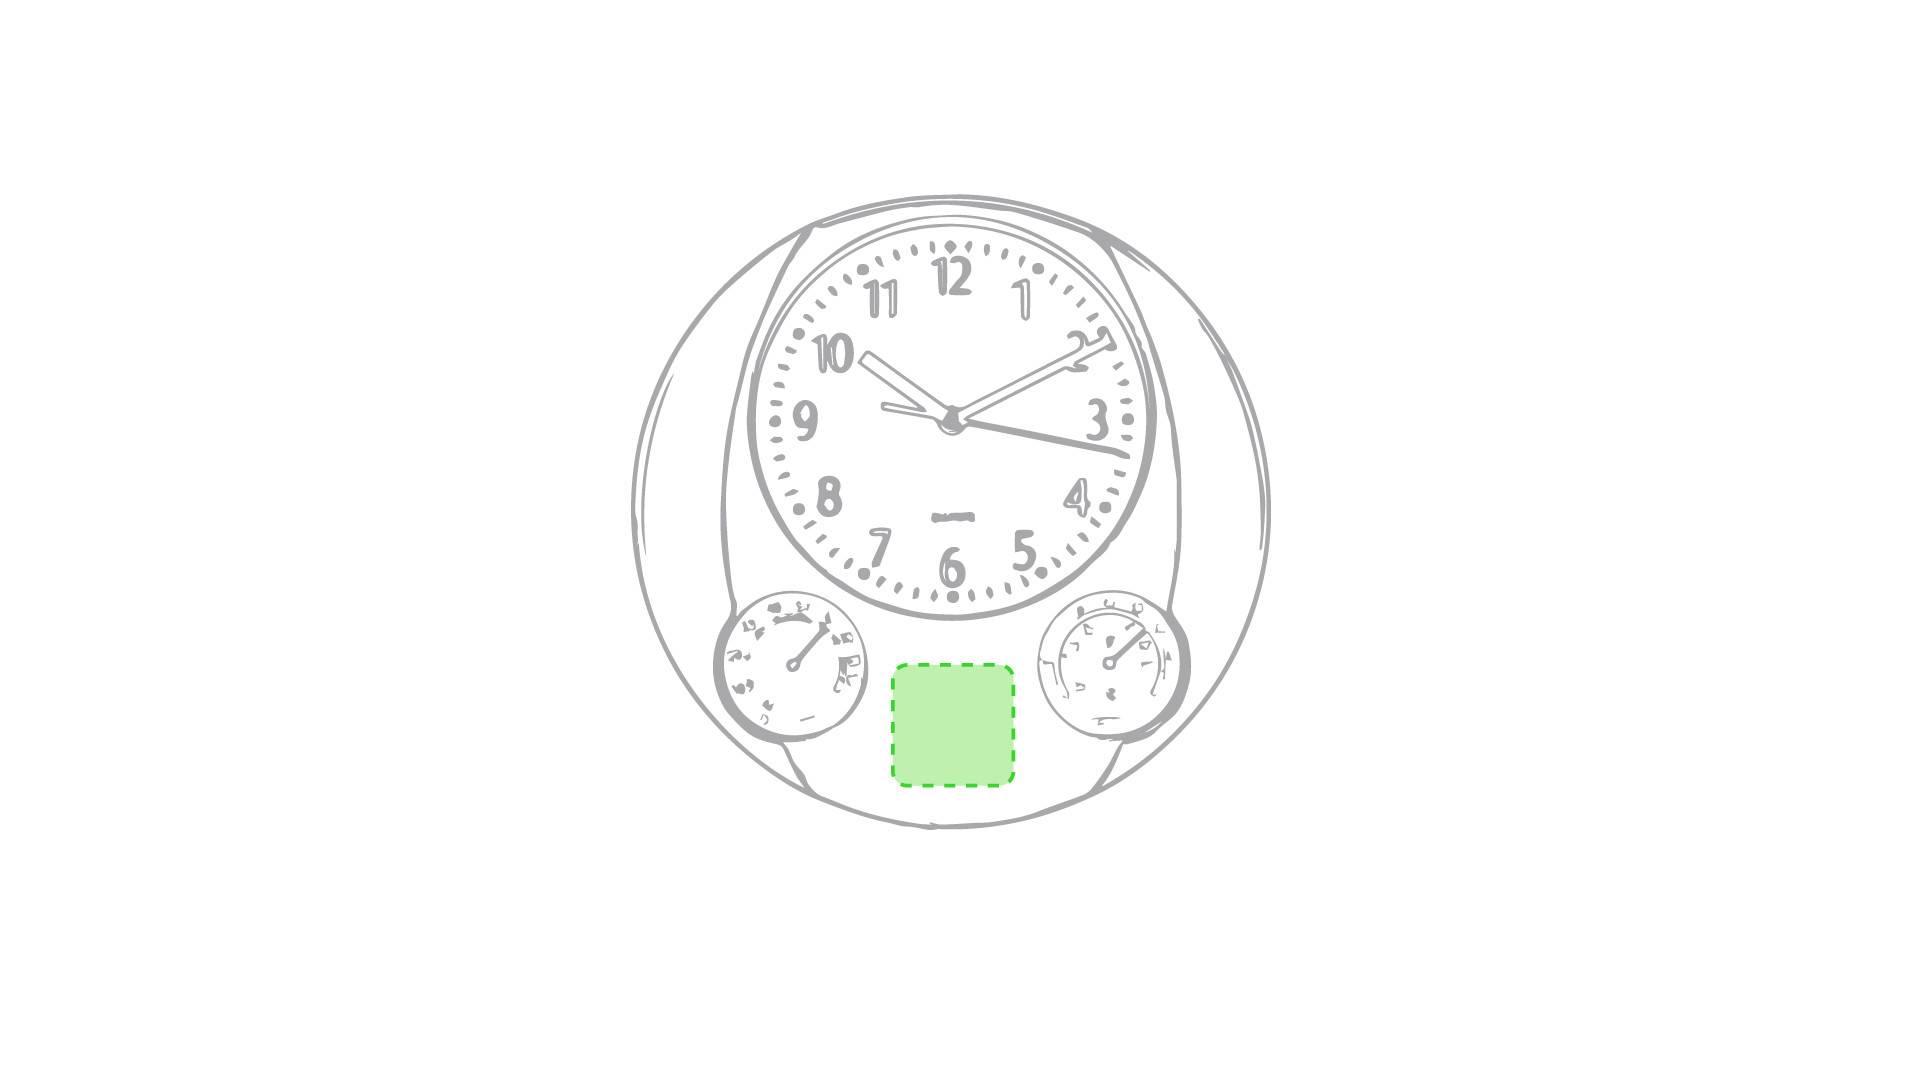 Reloj de pared con termómetro 2